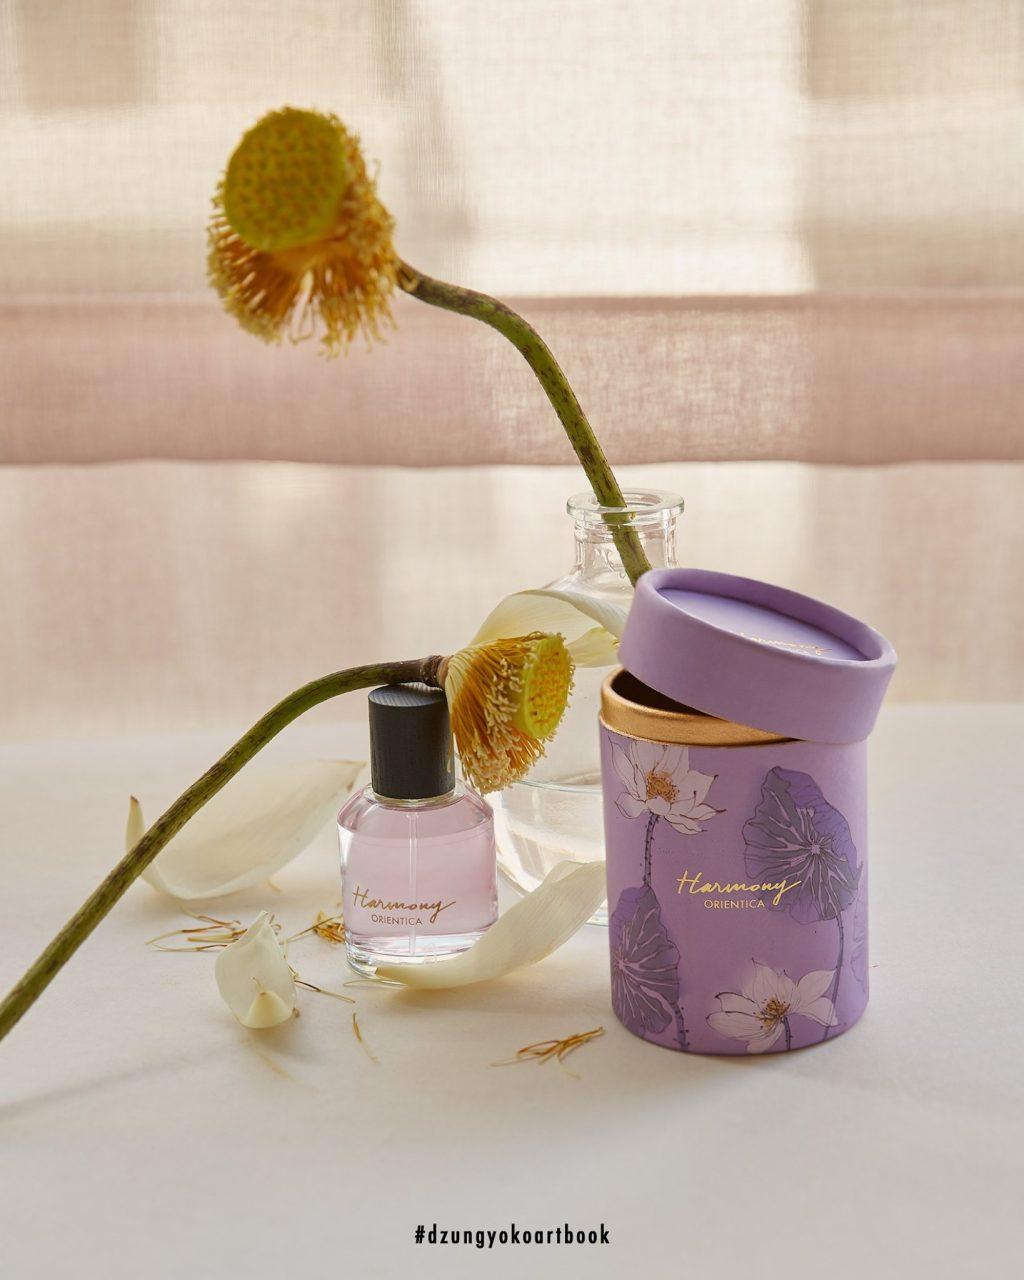 nước hoa Orientica harmony